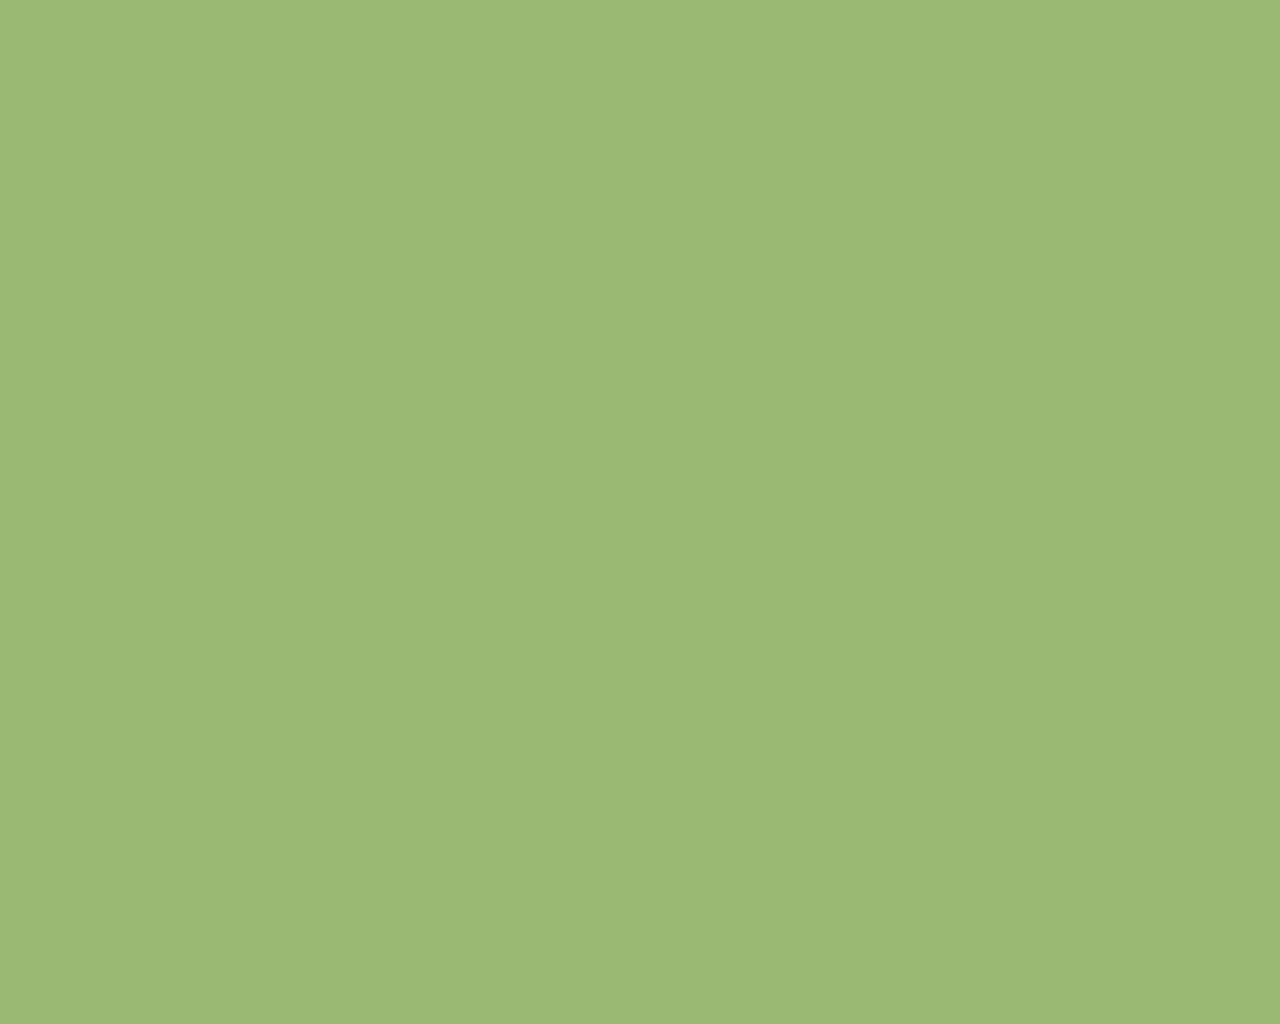 1280x1024 Olivine Solid Color Background